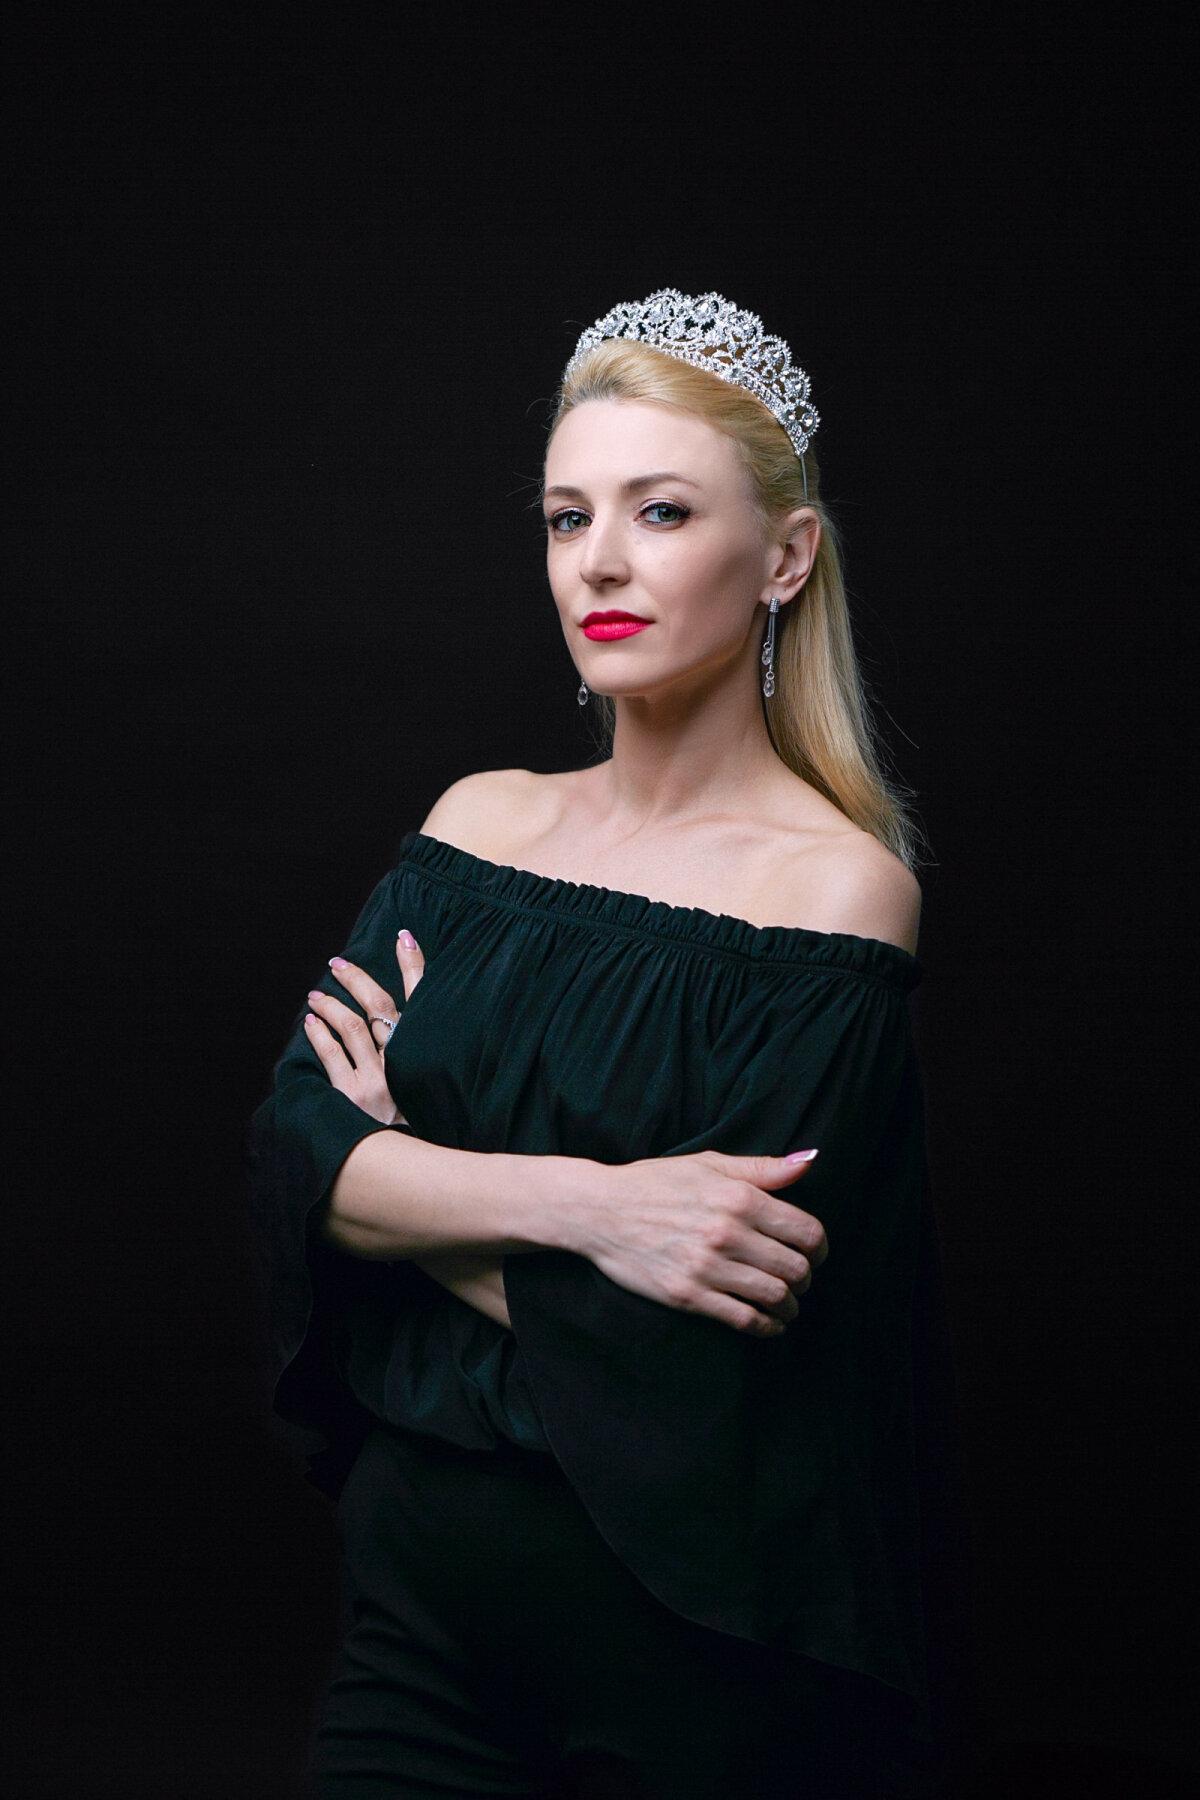 Обладательница титула Миссис Европа 2019 Людмила Карпикова